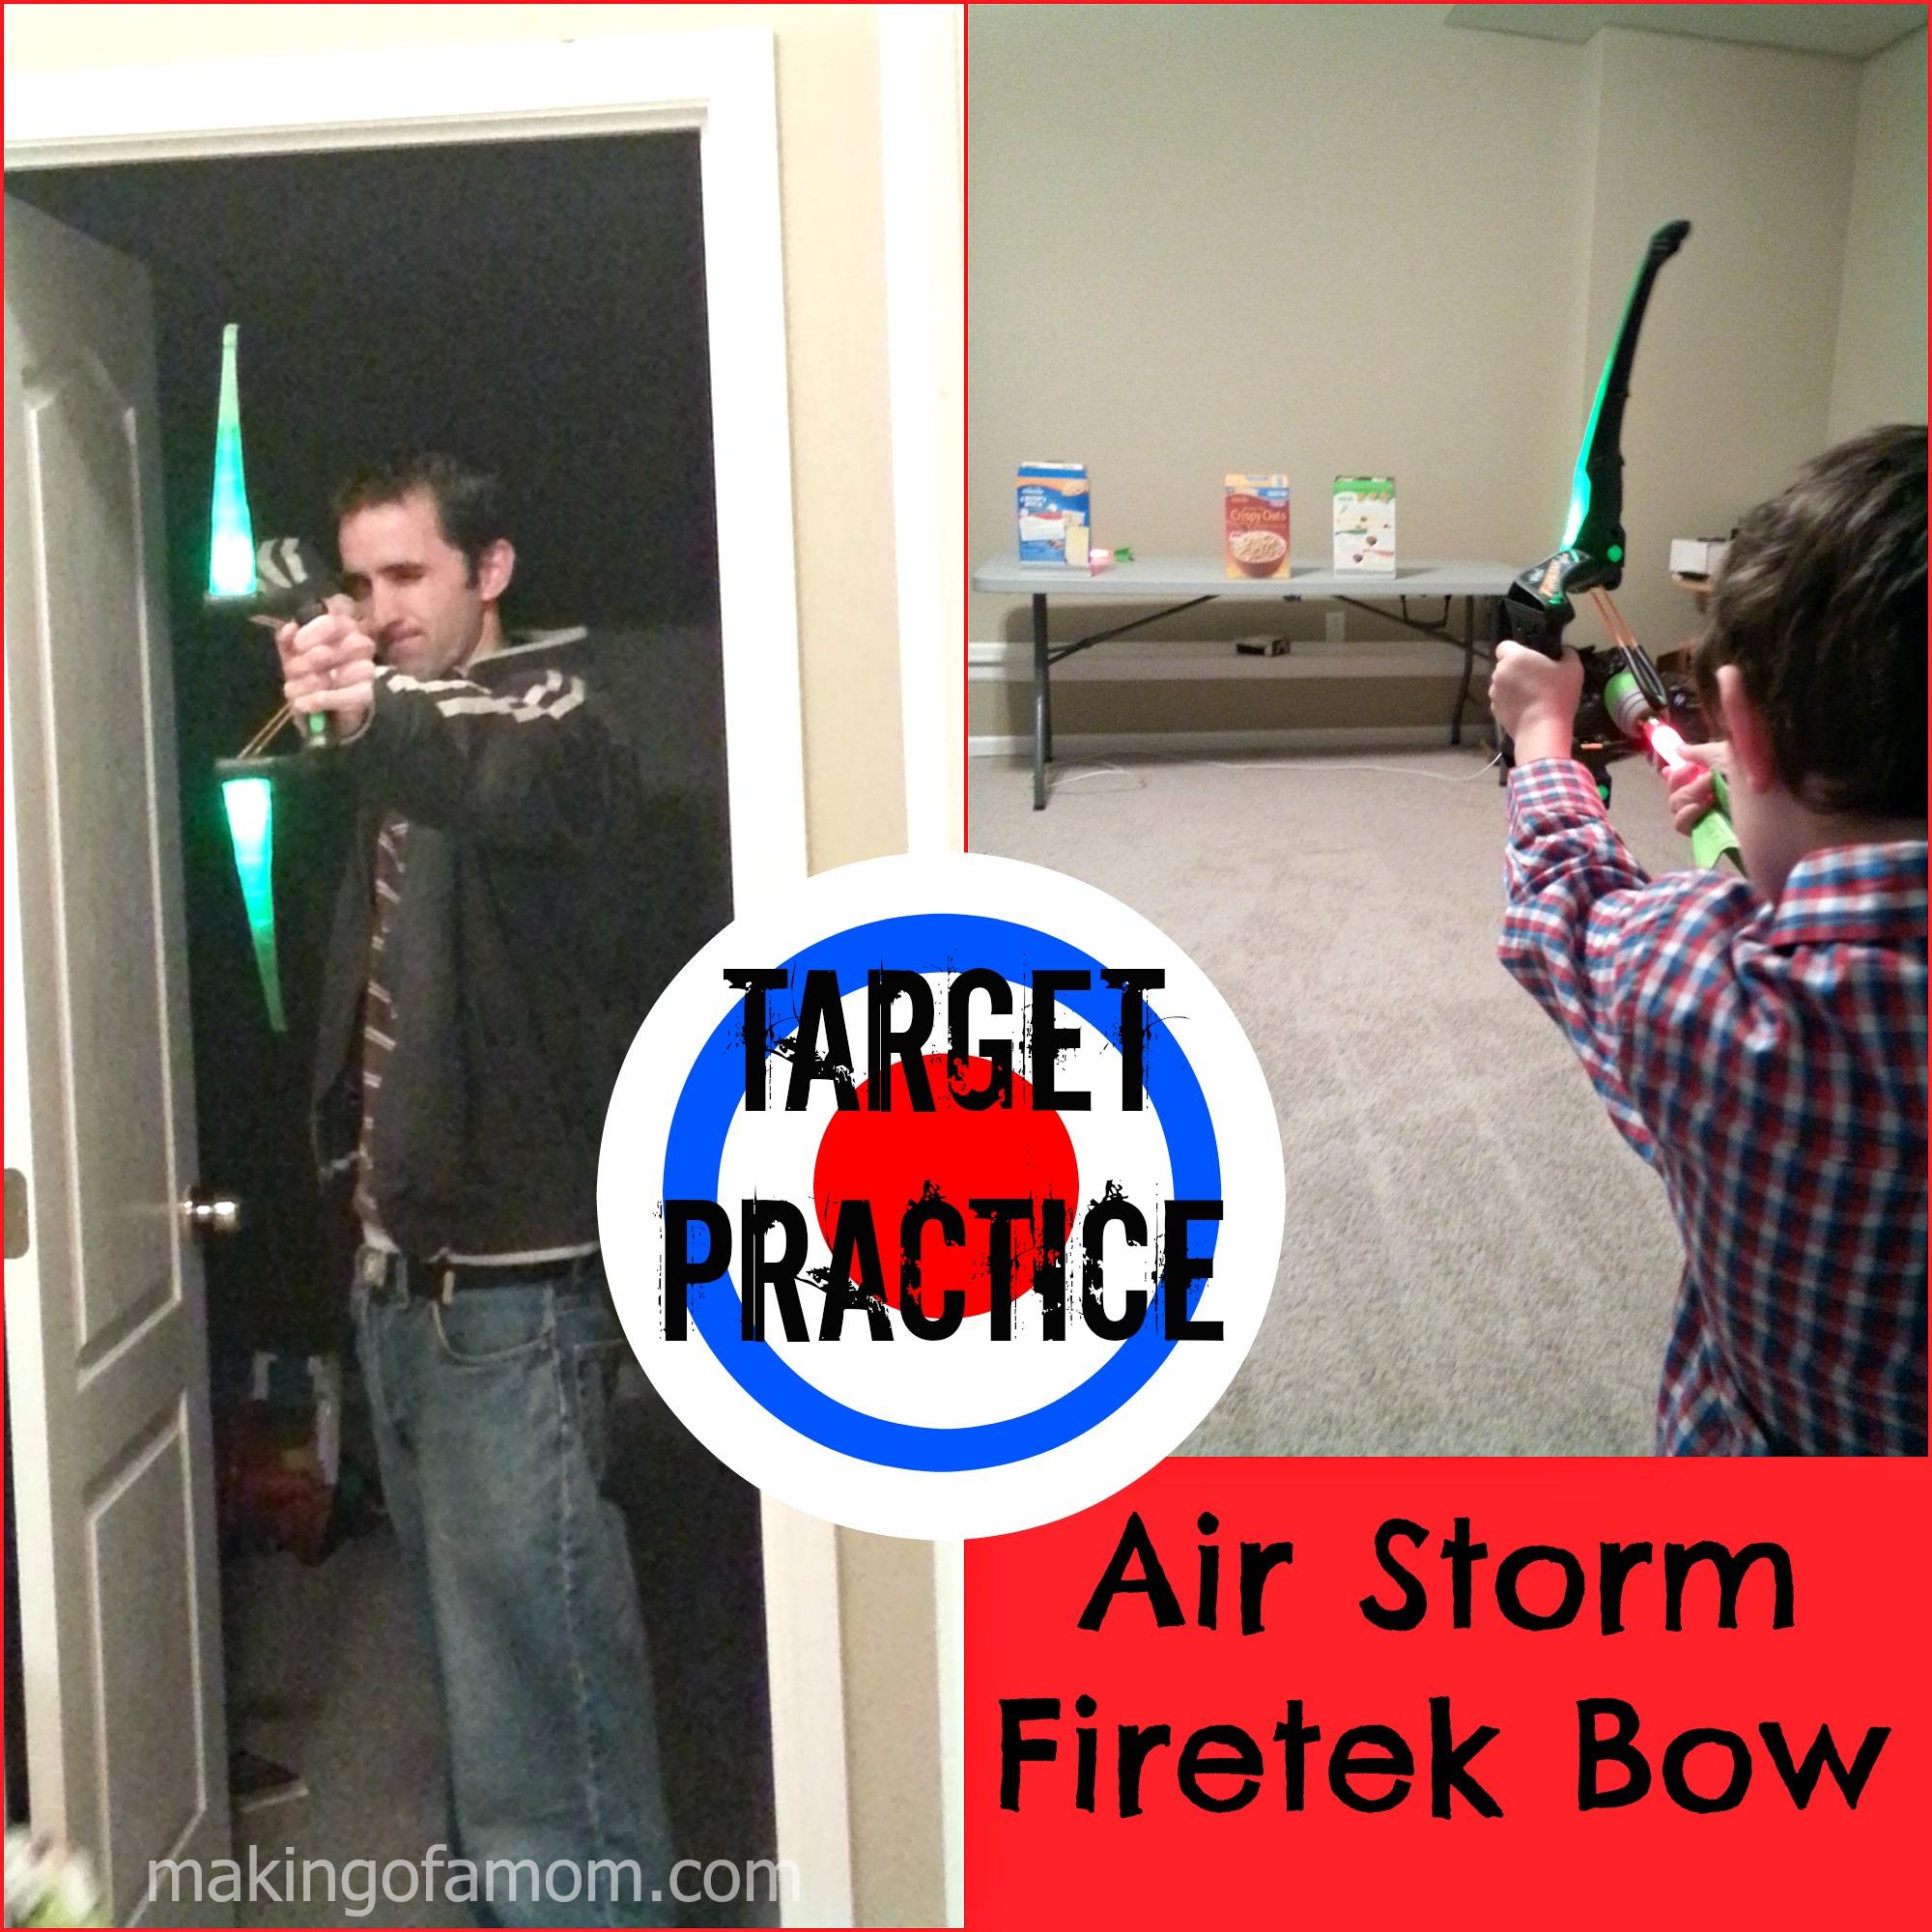 Target-Practice-Air-Storm-Firetek-Bow